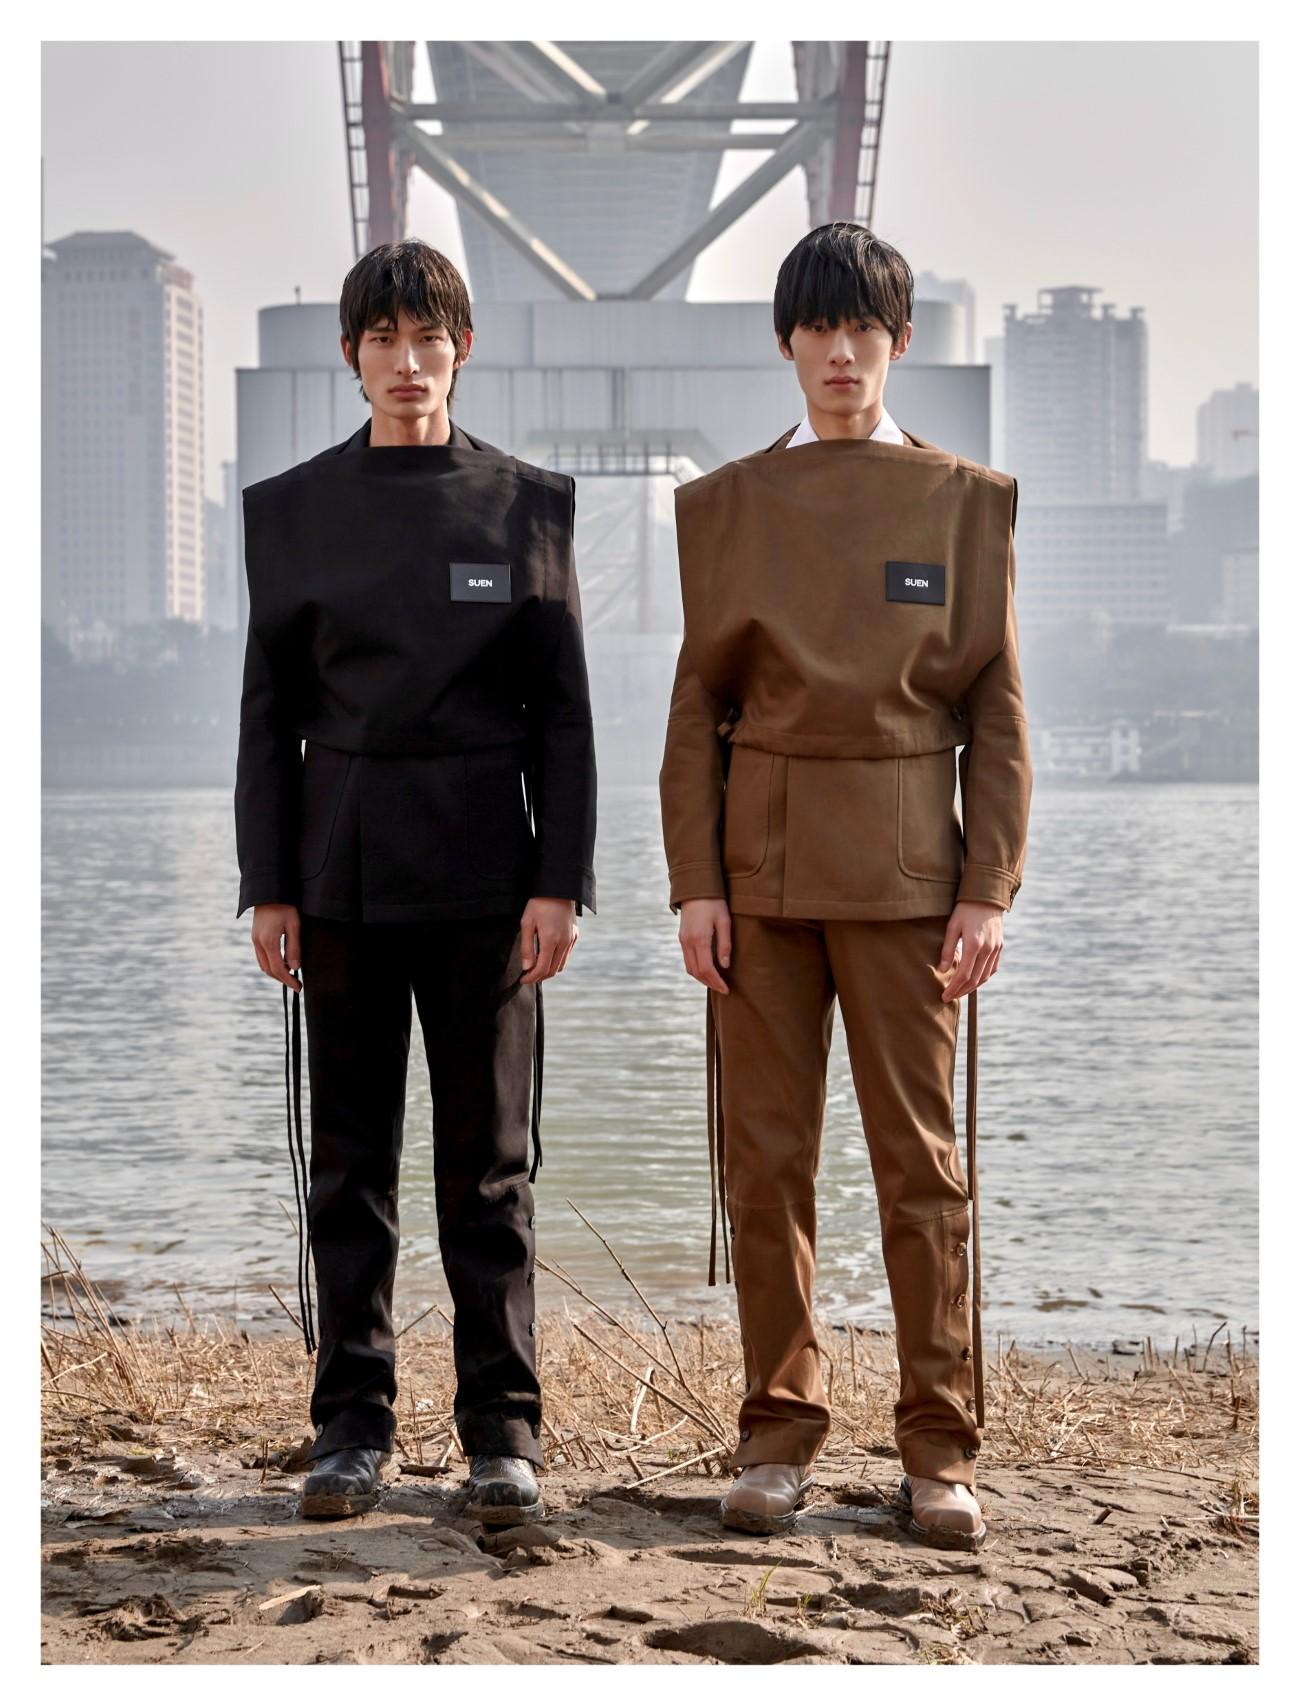 Sean Suen - Automne-Hiver 2021 - Paris Fashion Week